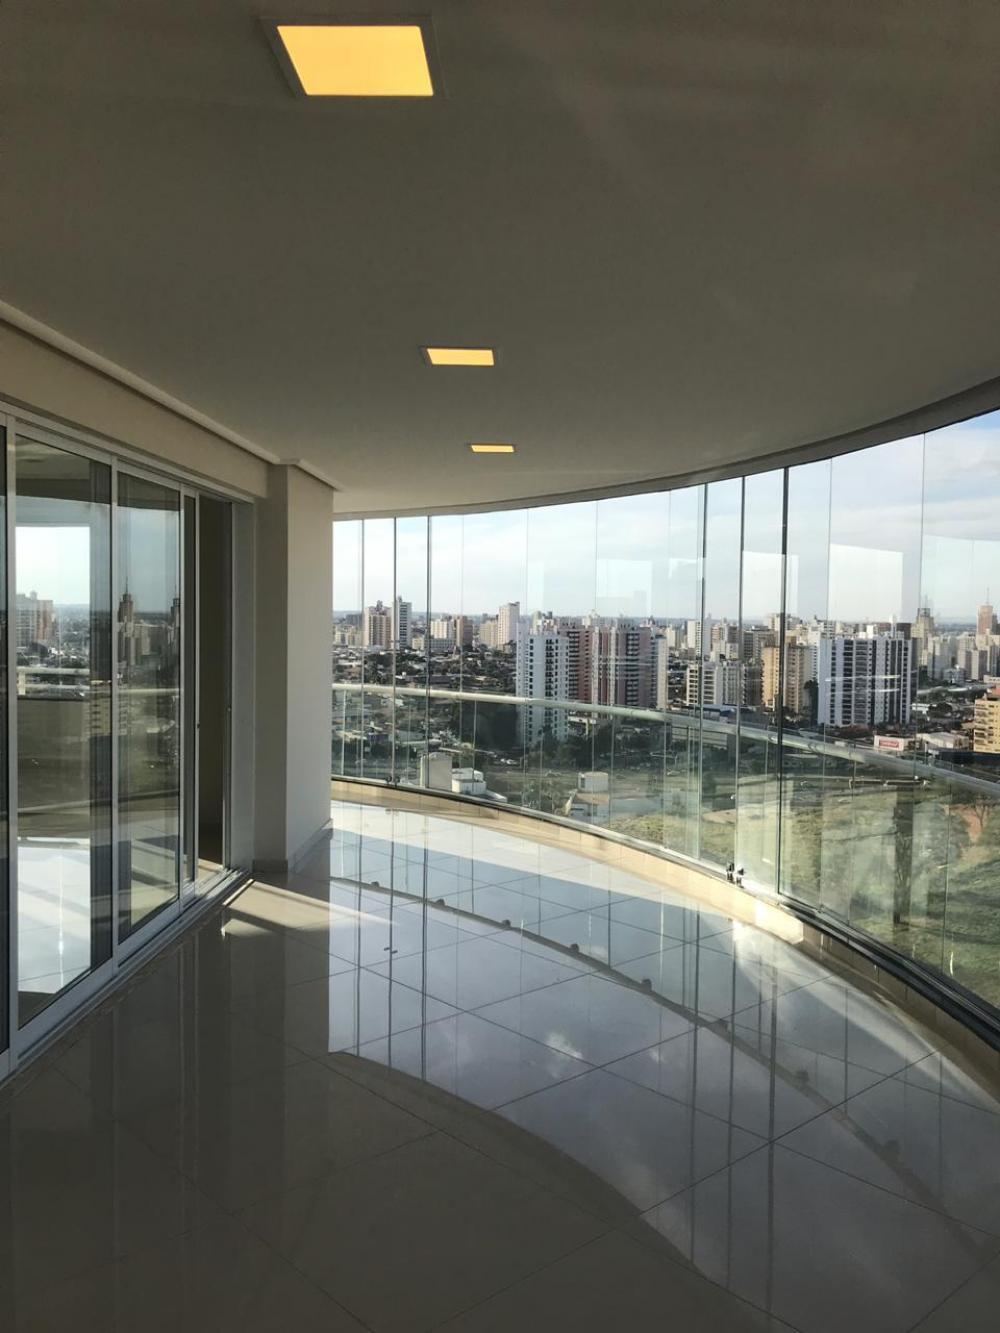 SAO JOSE DO RIO PRETO Apartamento Venda R$2.400.000,00 Condominio R$2.500,00 4 Dormitorios 4 Suites Area construida 460.00m2